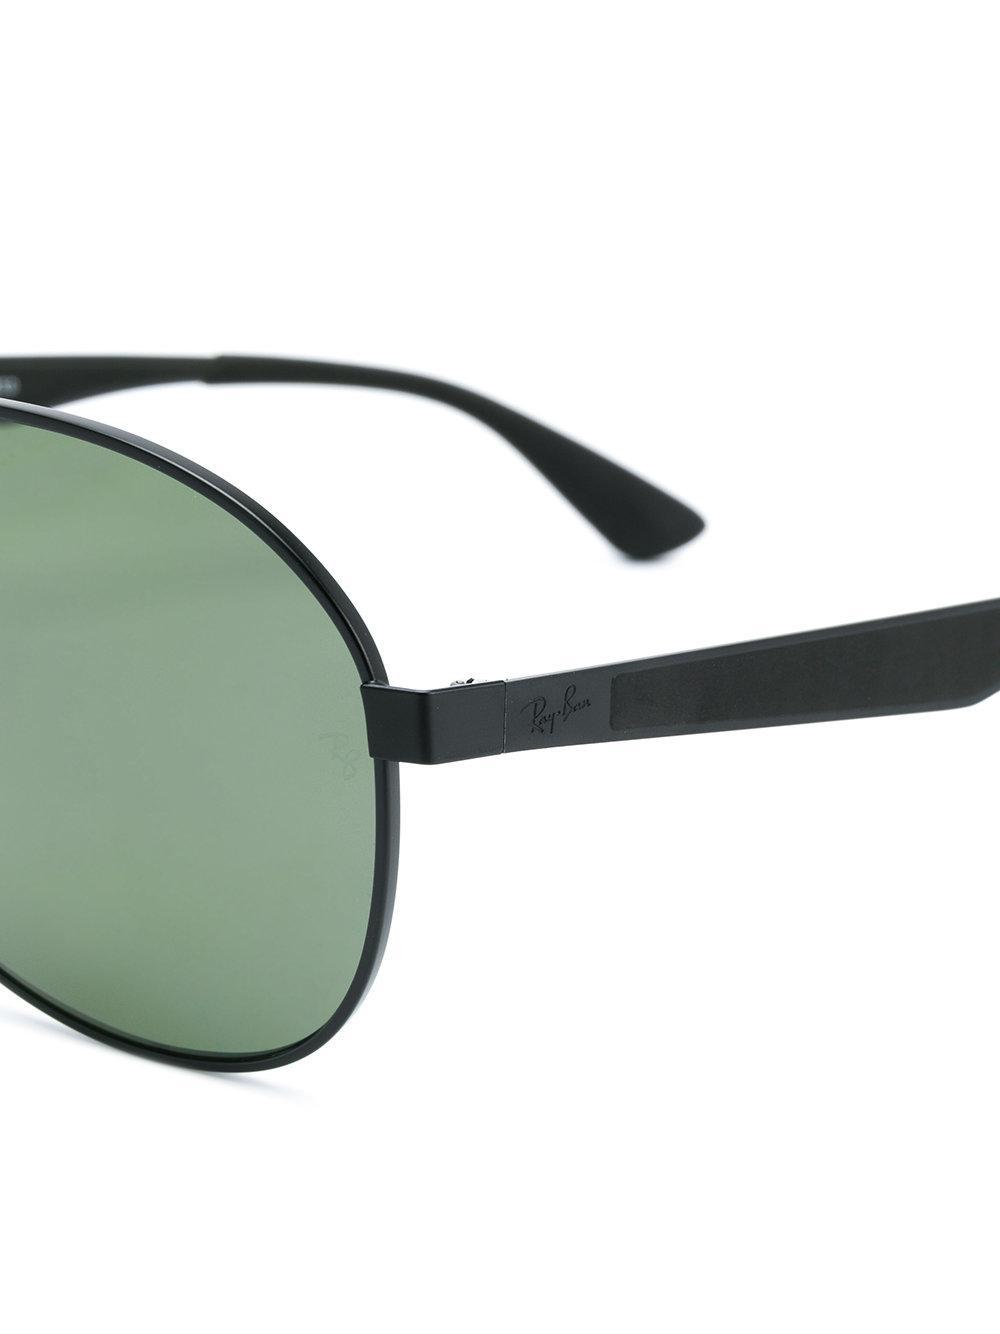 Ray-Ban Rubber Aviator Polarized Sunglasses in Black for Men